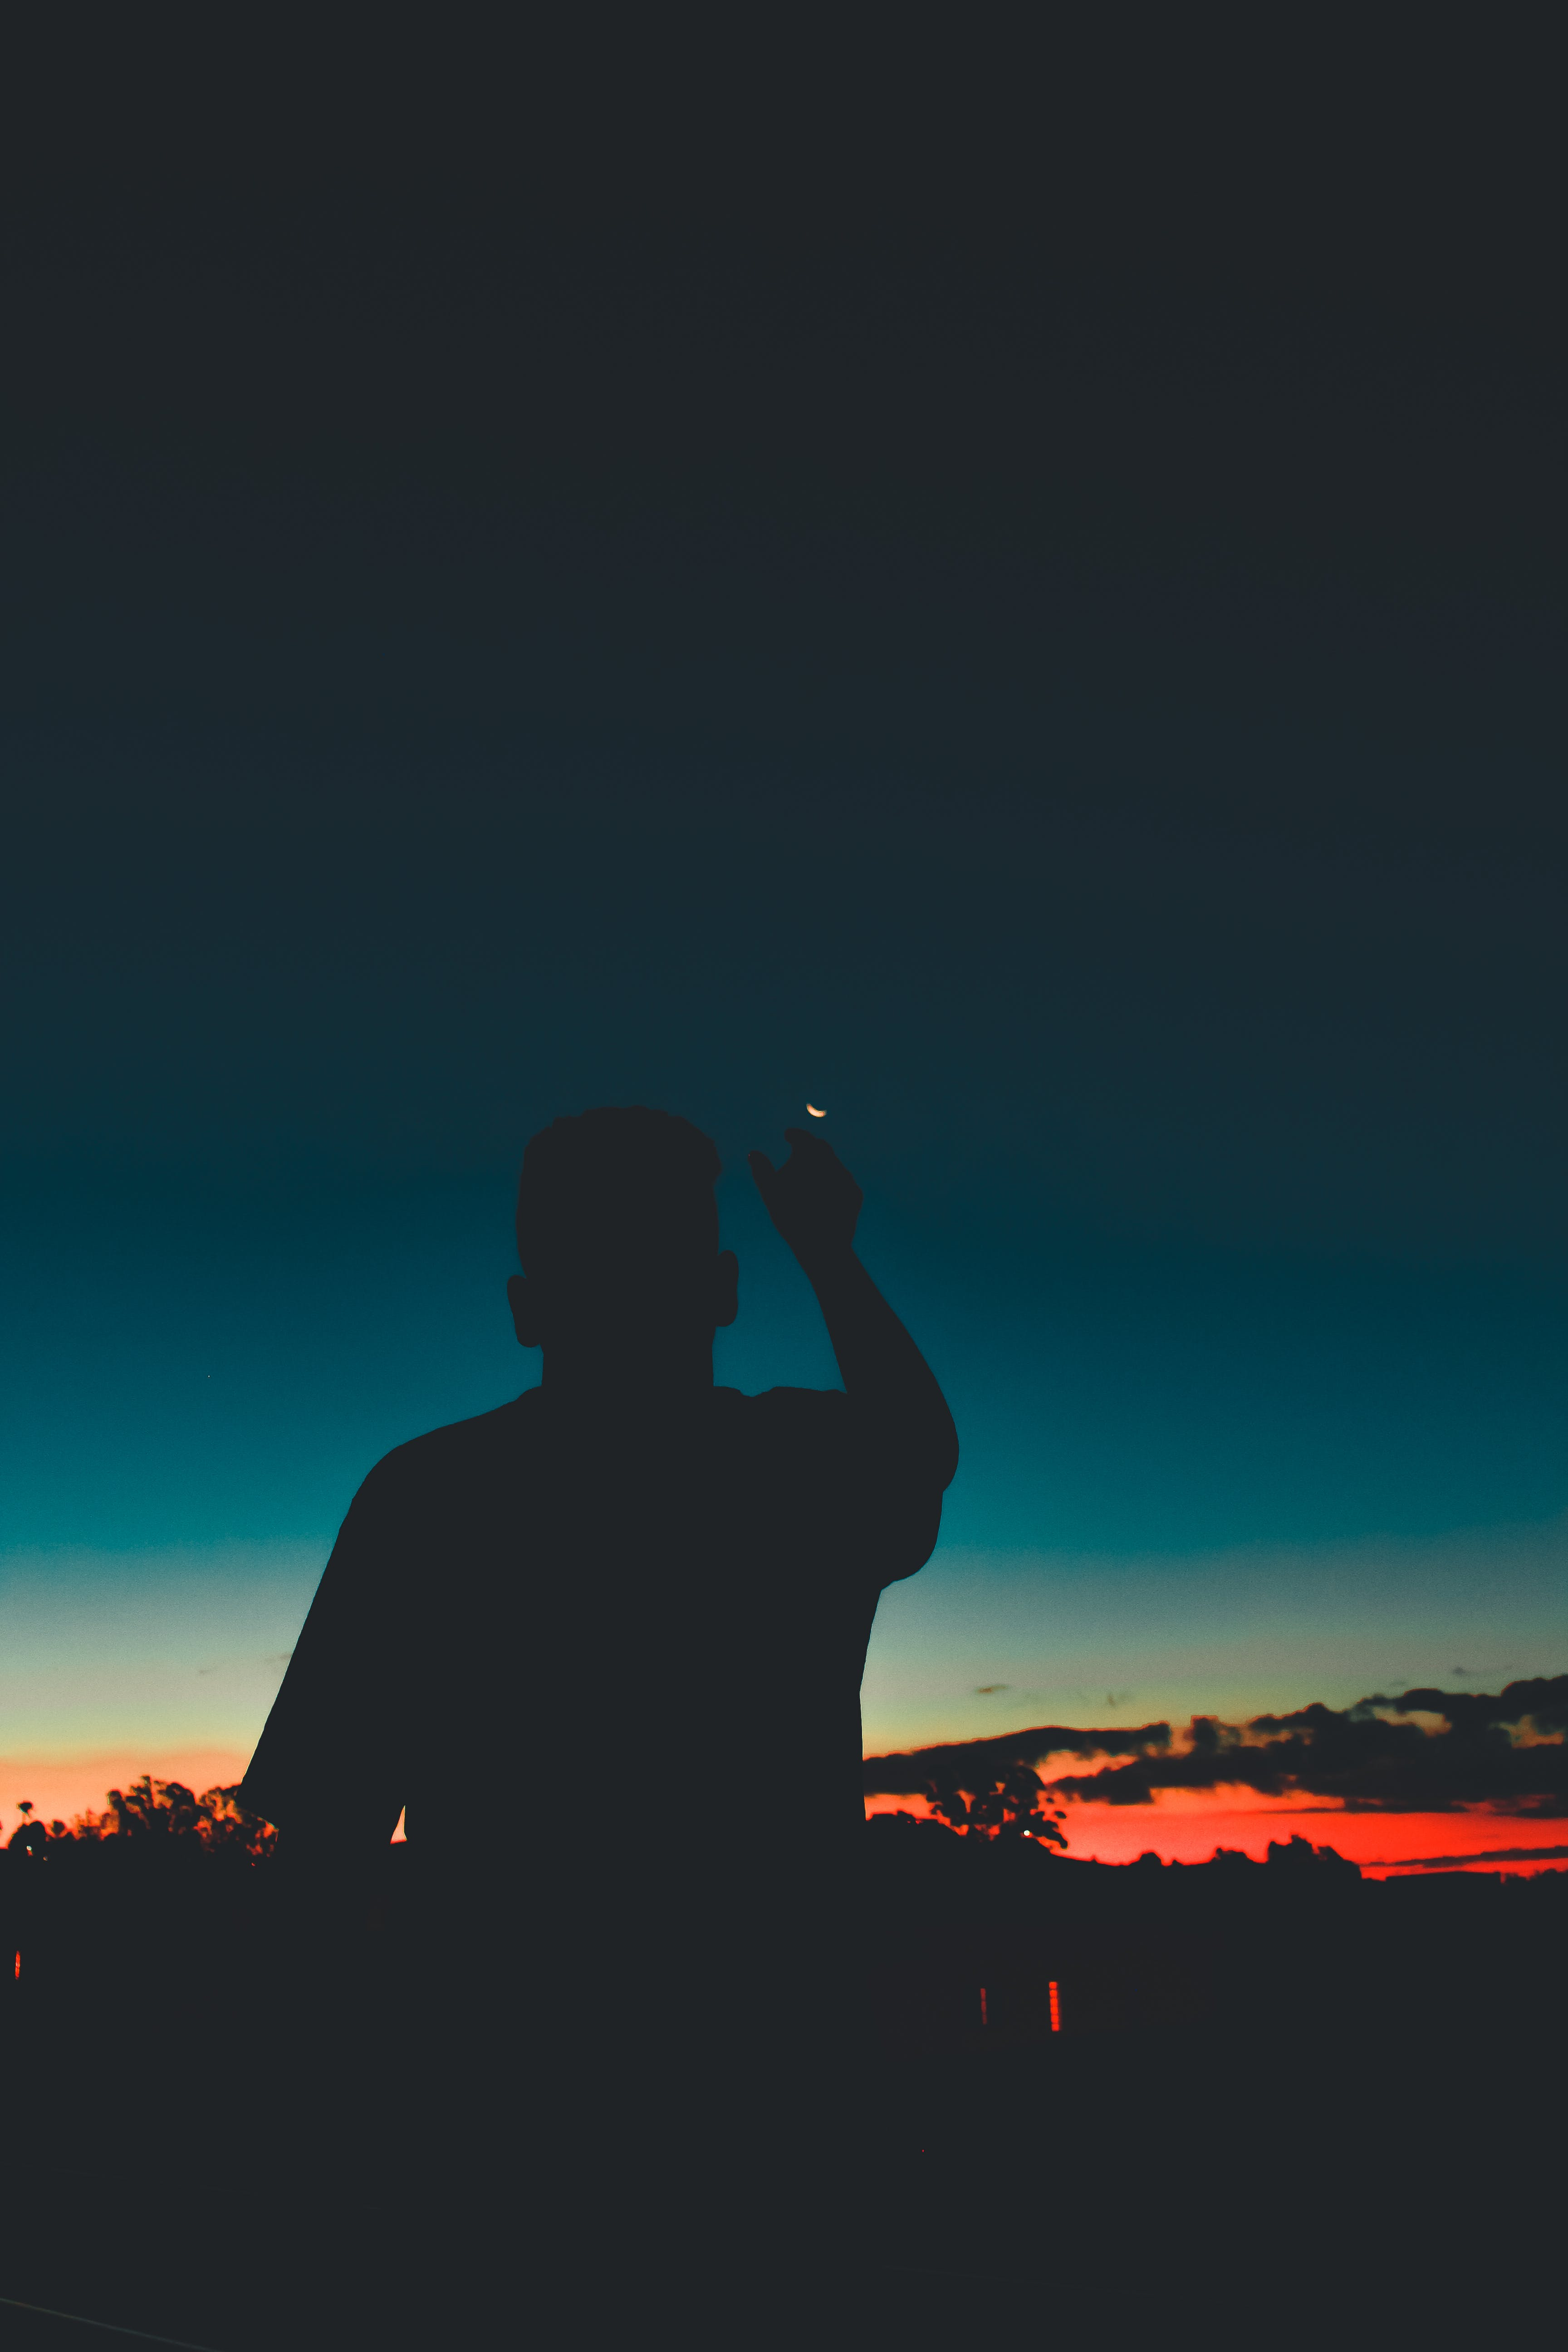 Kostenloses Stock Foto zu dämmerung, dunkel, himmel, hinterleuchtet